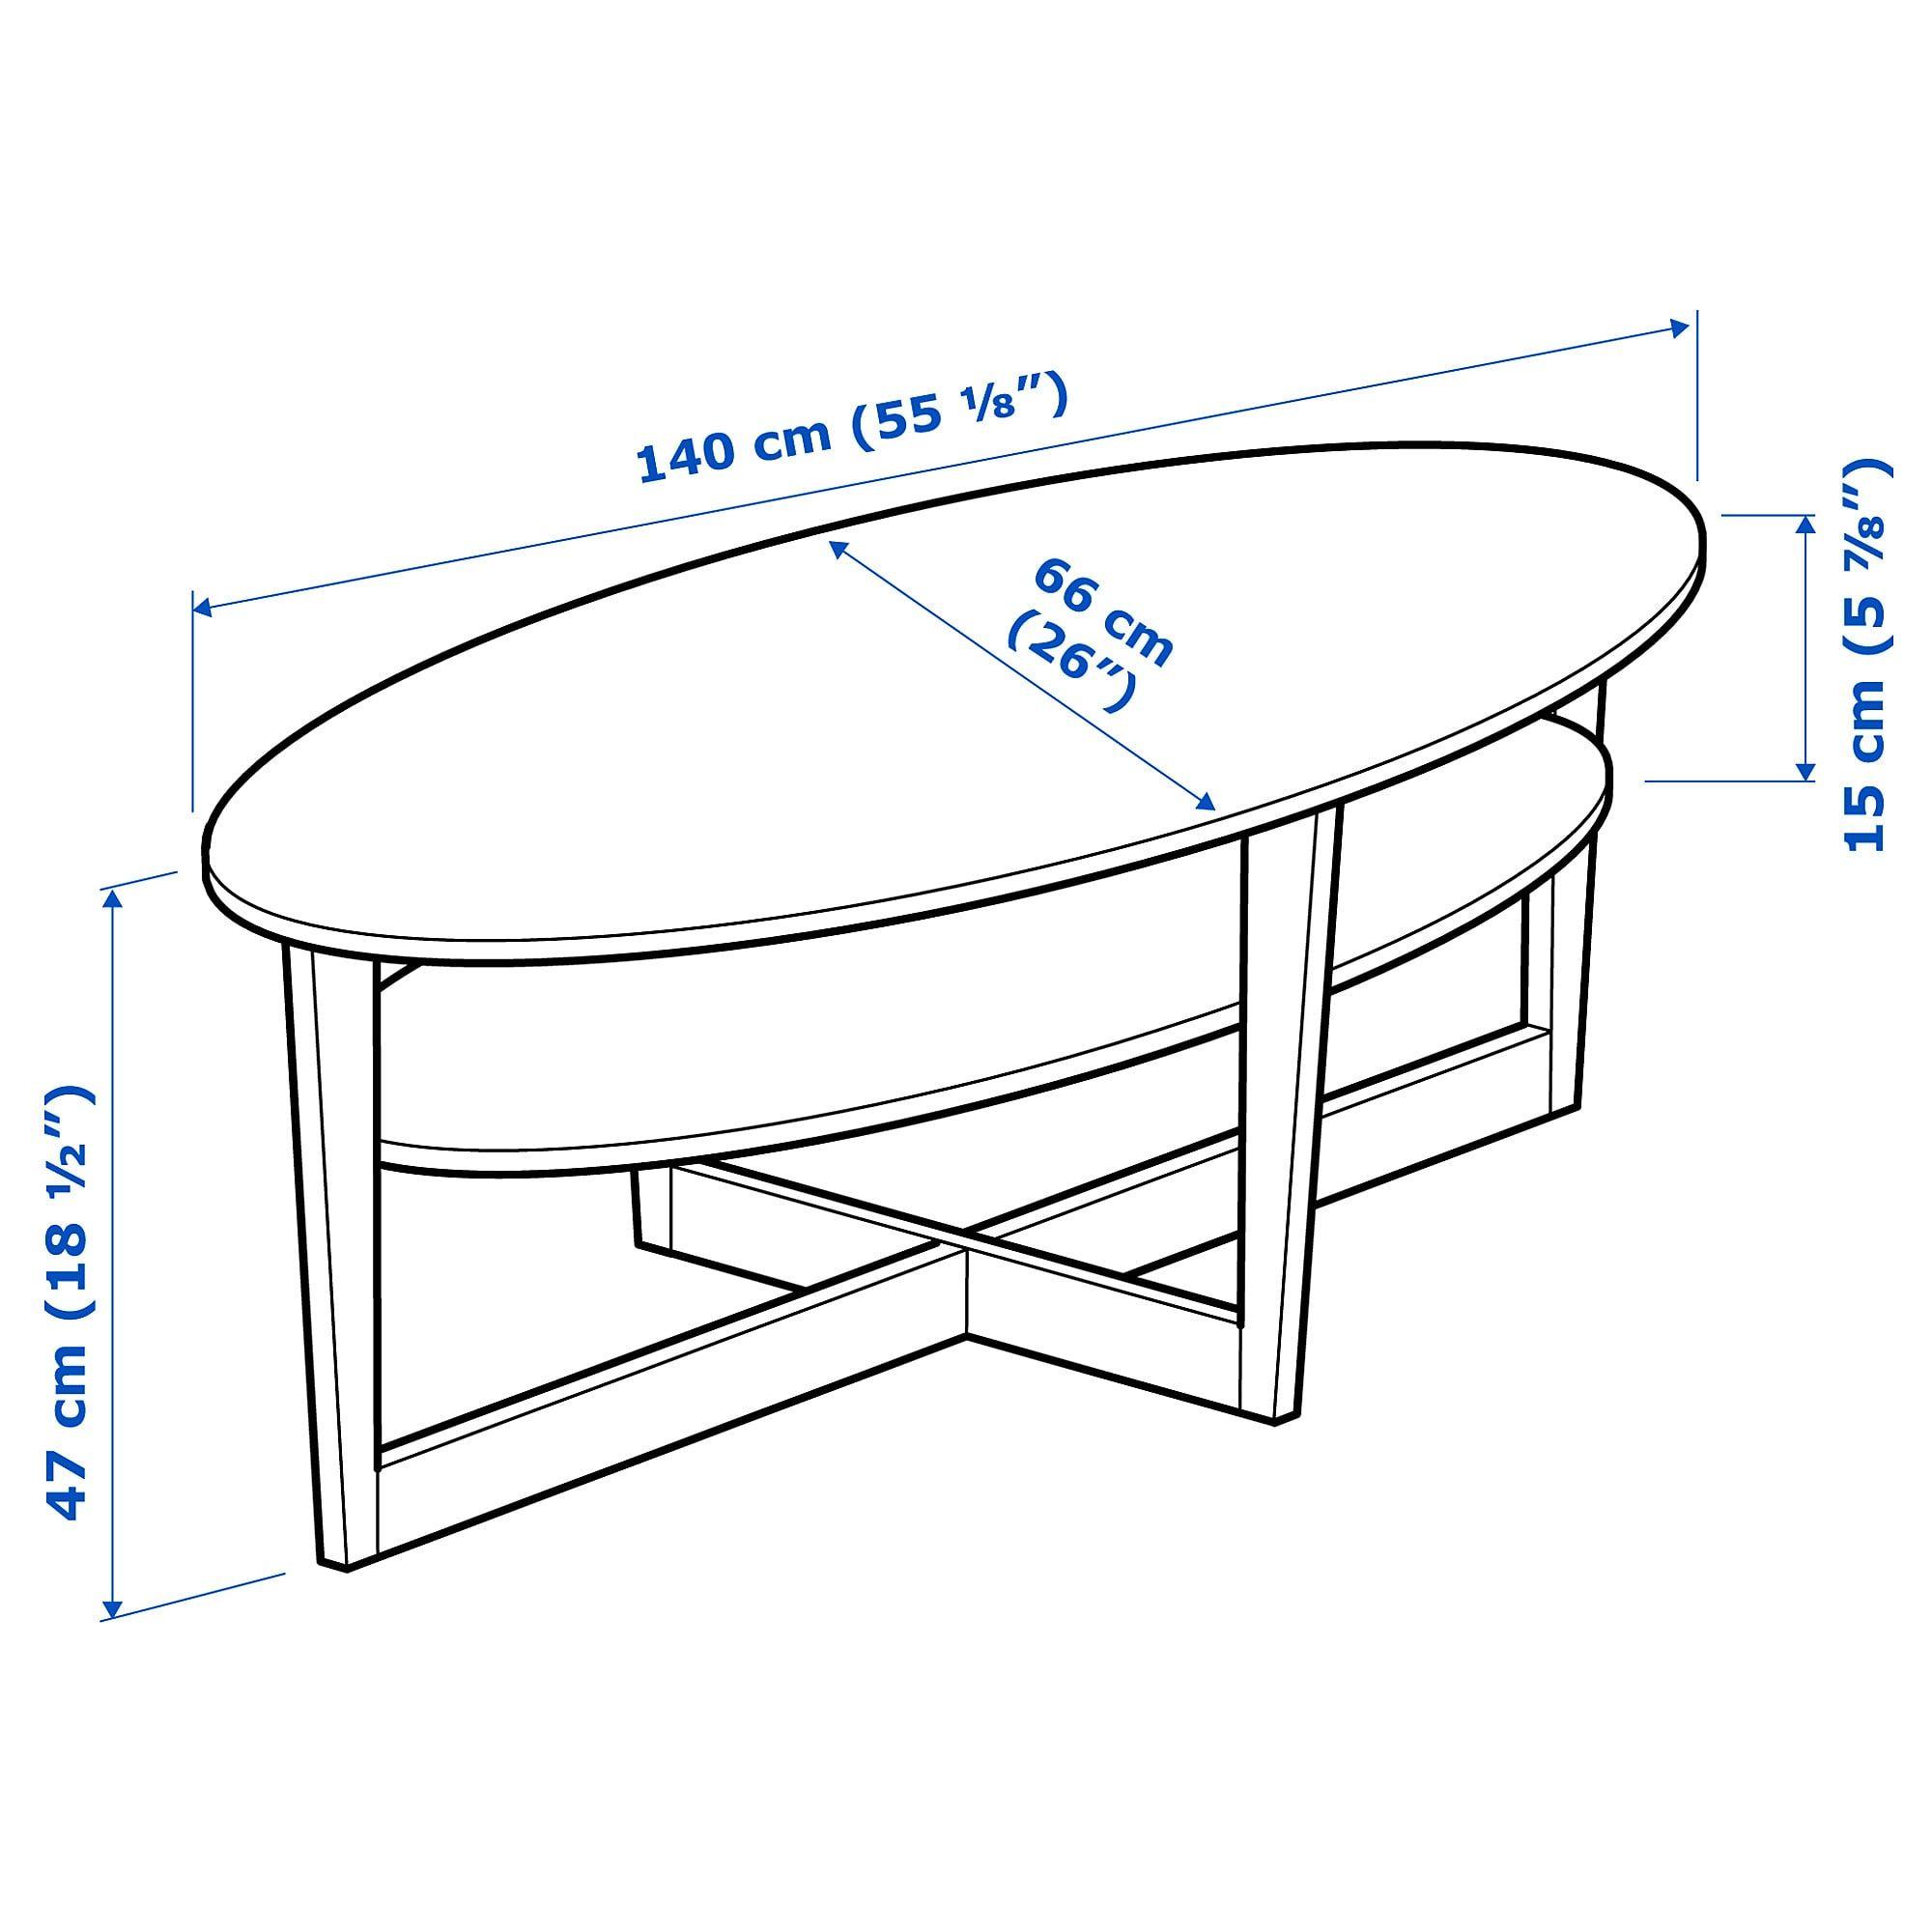 Home Furniture Store Modern Furnishings Decor Coffee Table At Home Furniture Store Coffee Table Dimensions [ 2000 x 2000 Pixel ]